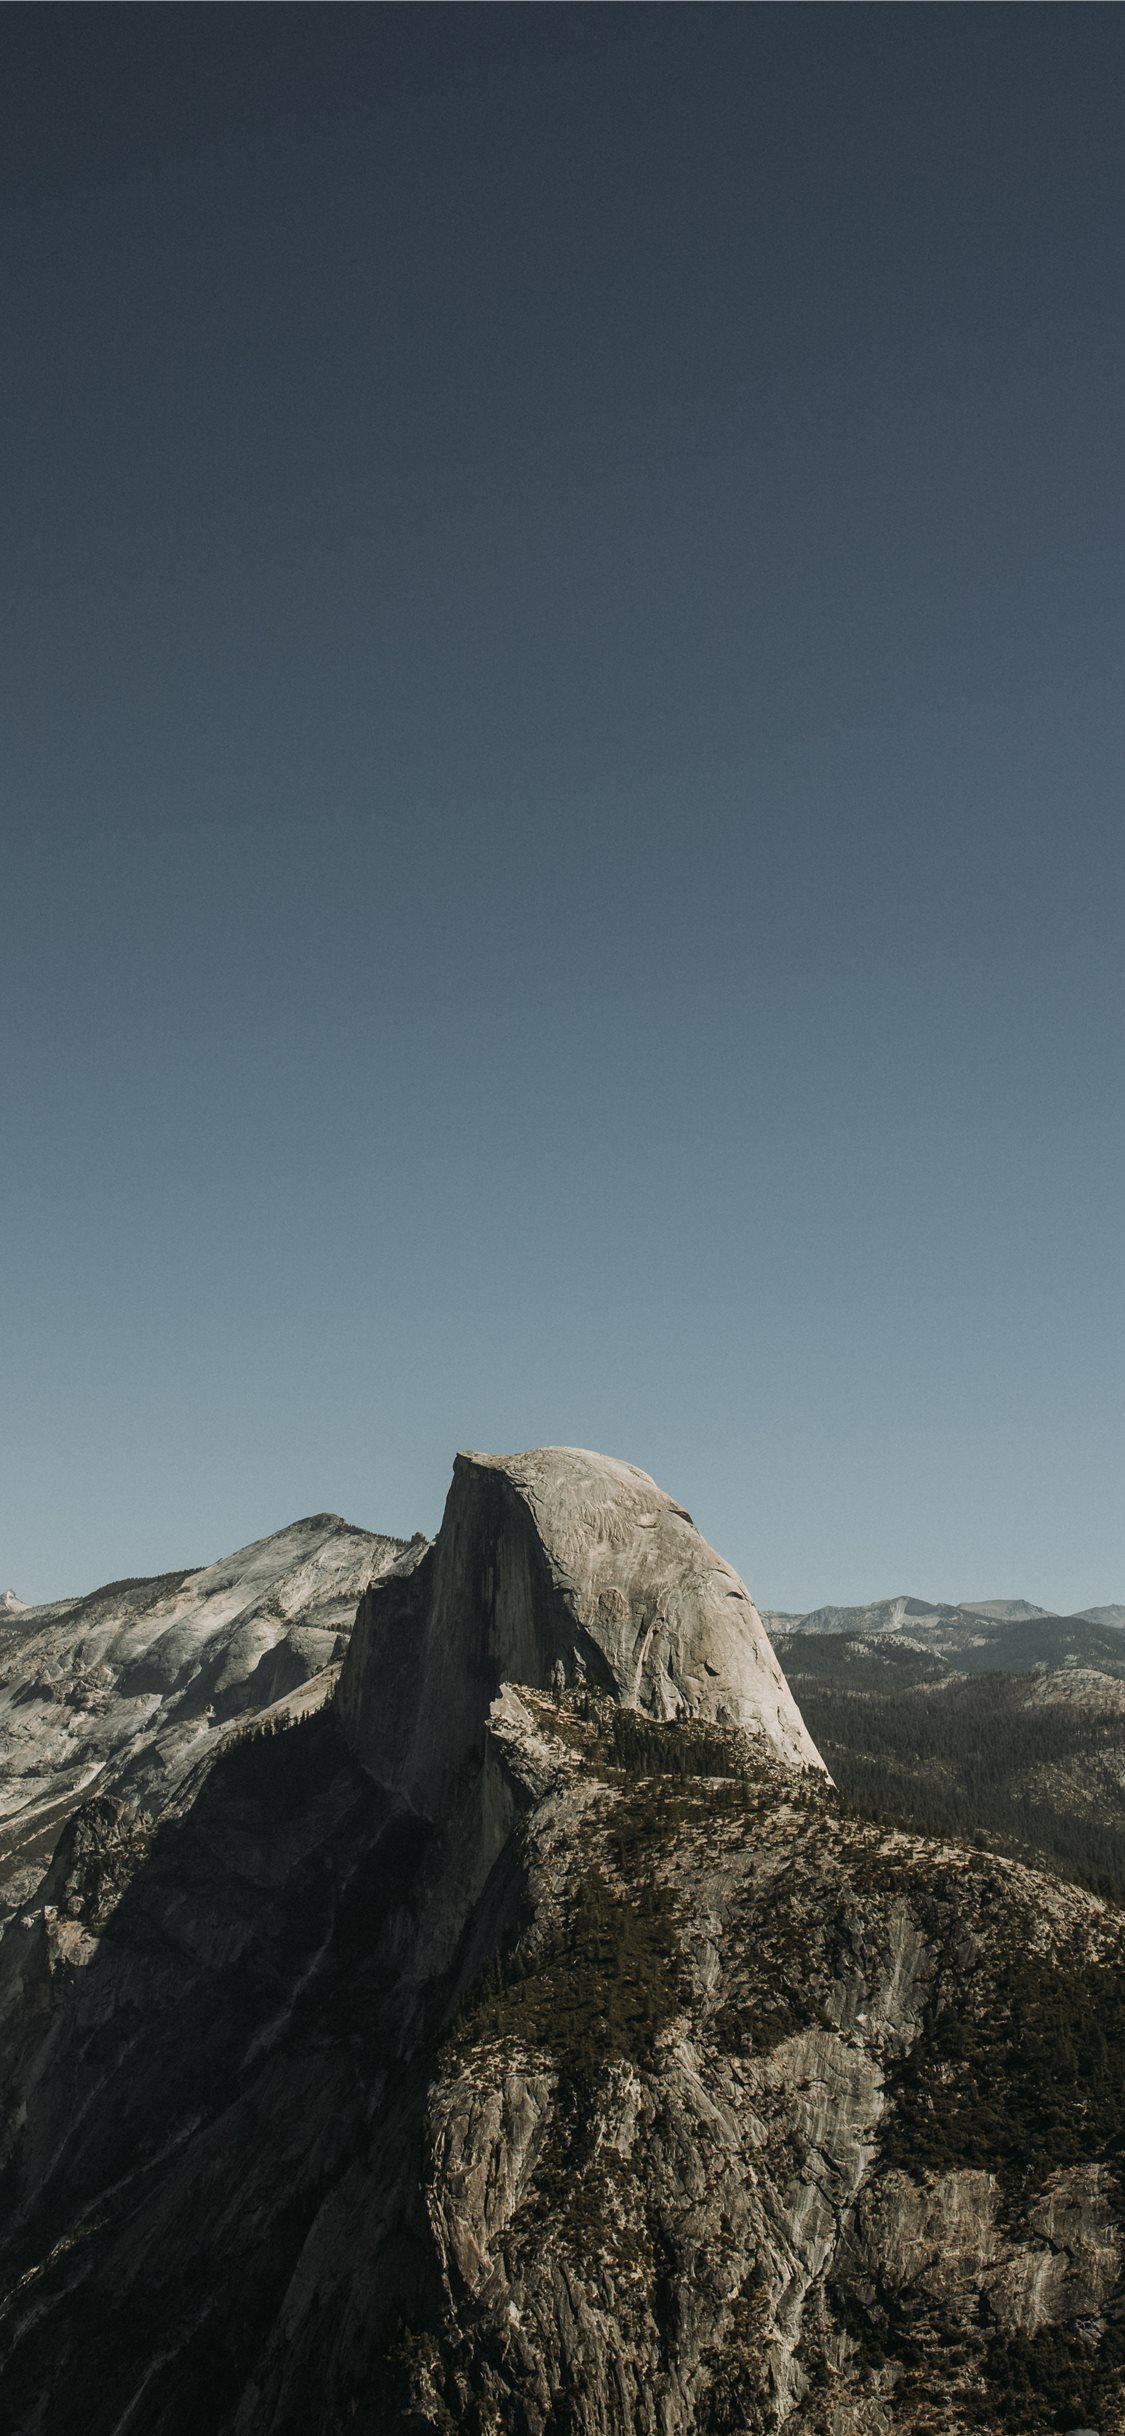 Glacier Point Yosemite Valley United